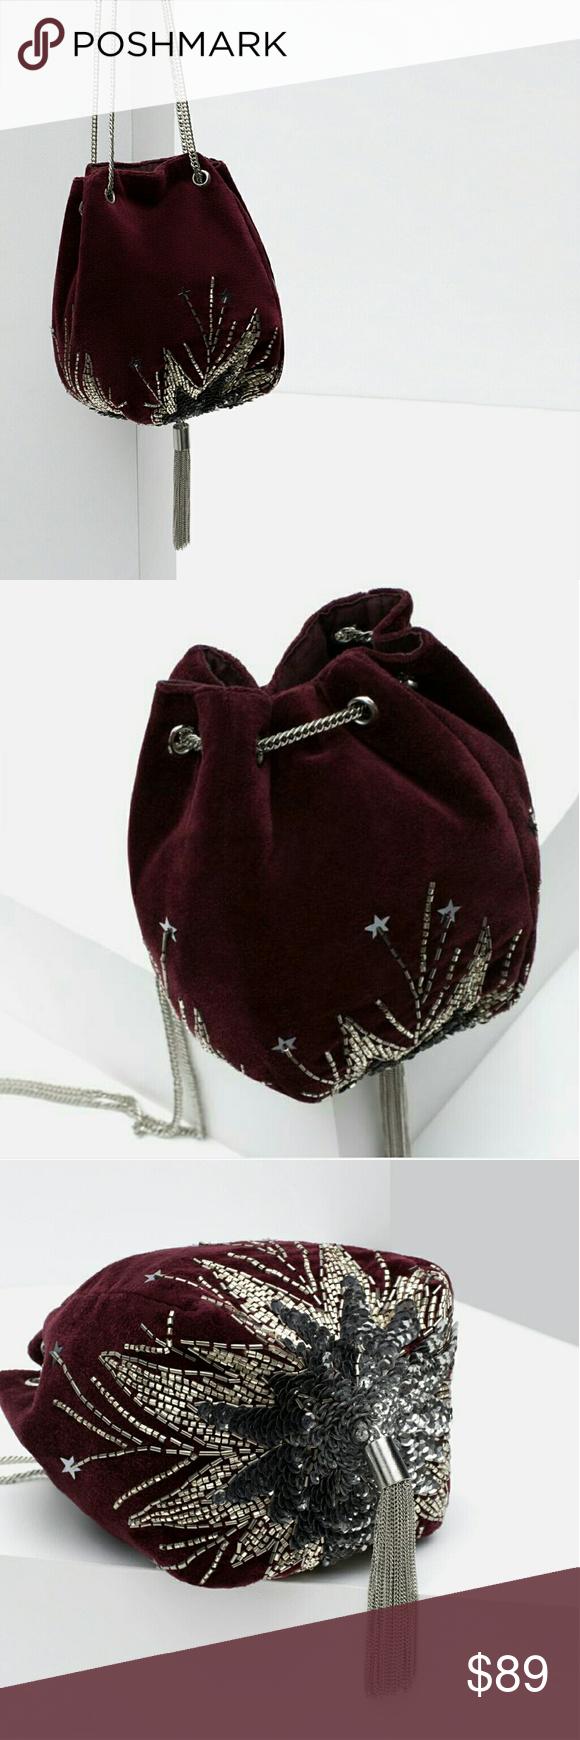 Zara Hand Beaded Velvet Evening Bucket Bag Nwt Zara Hand